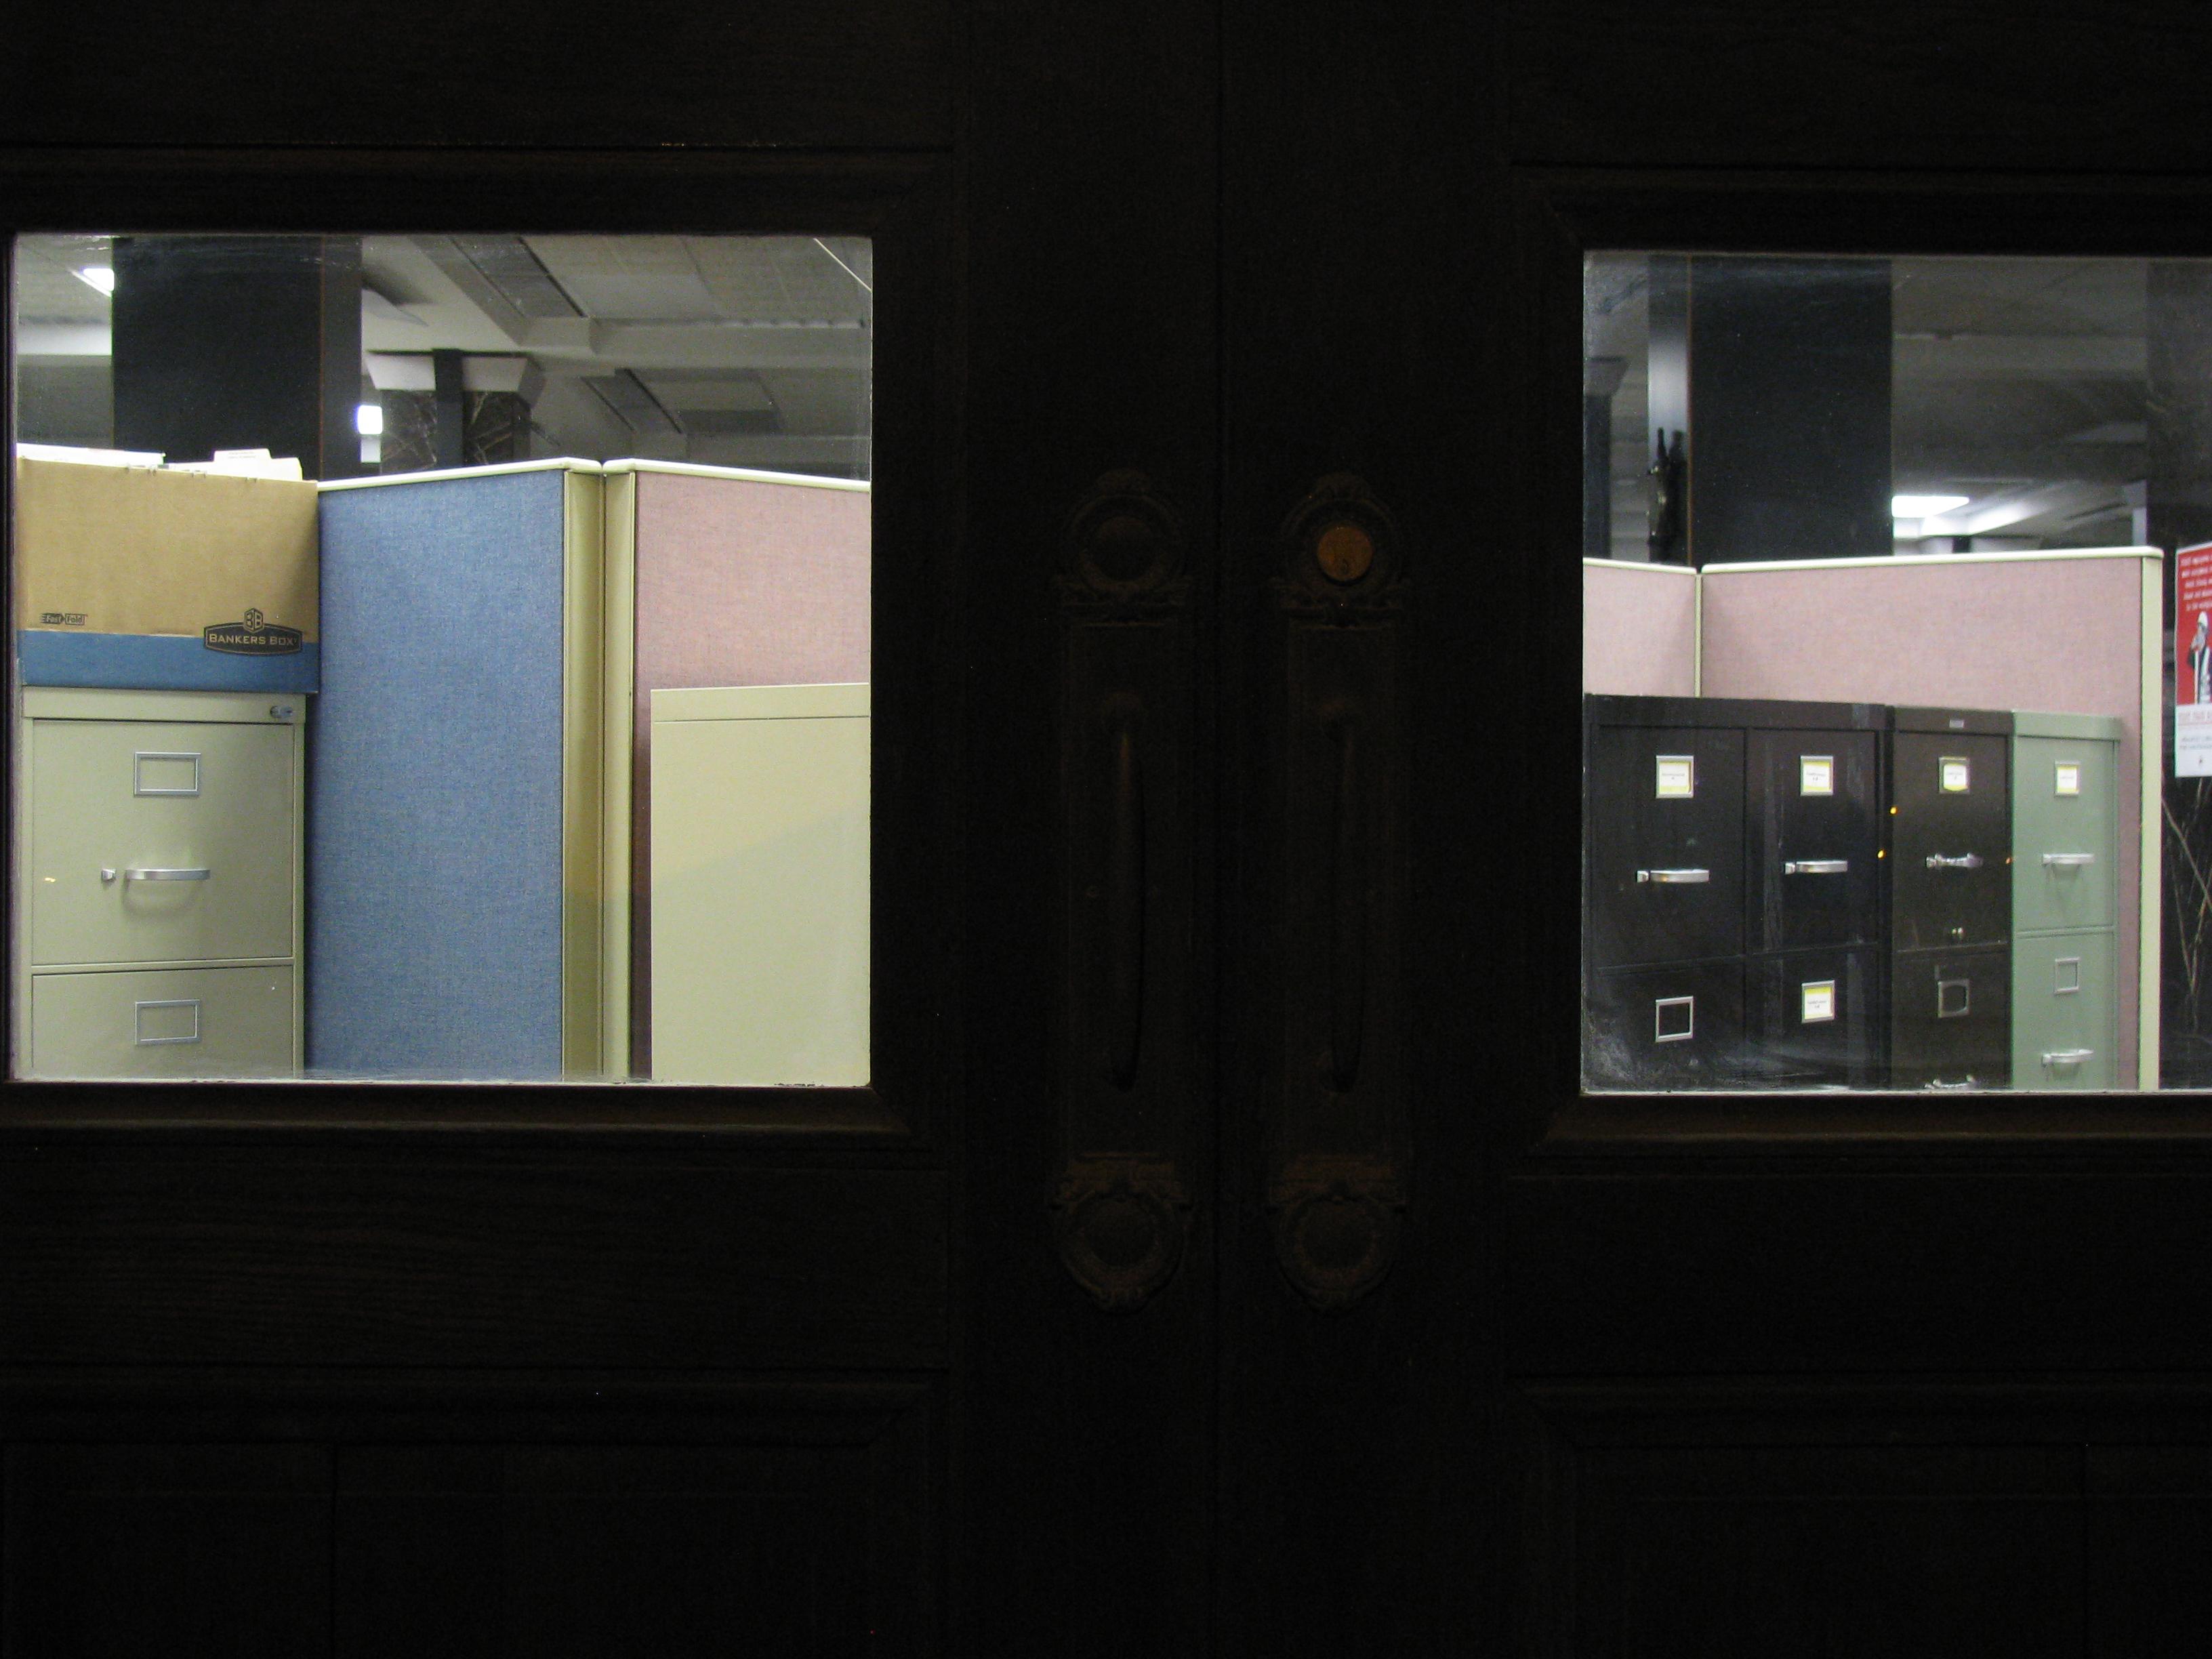 Harvard Square Apartments Metairie